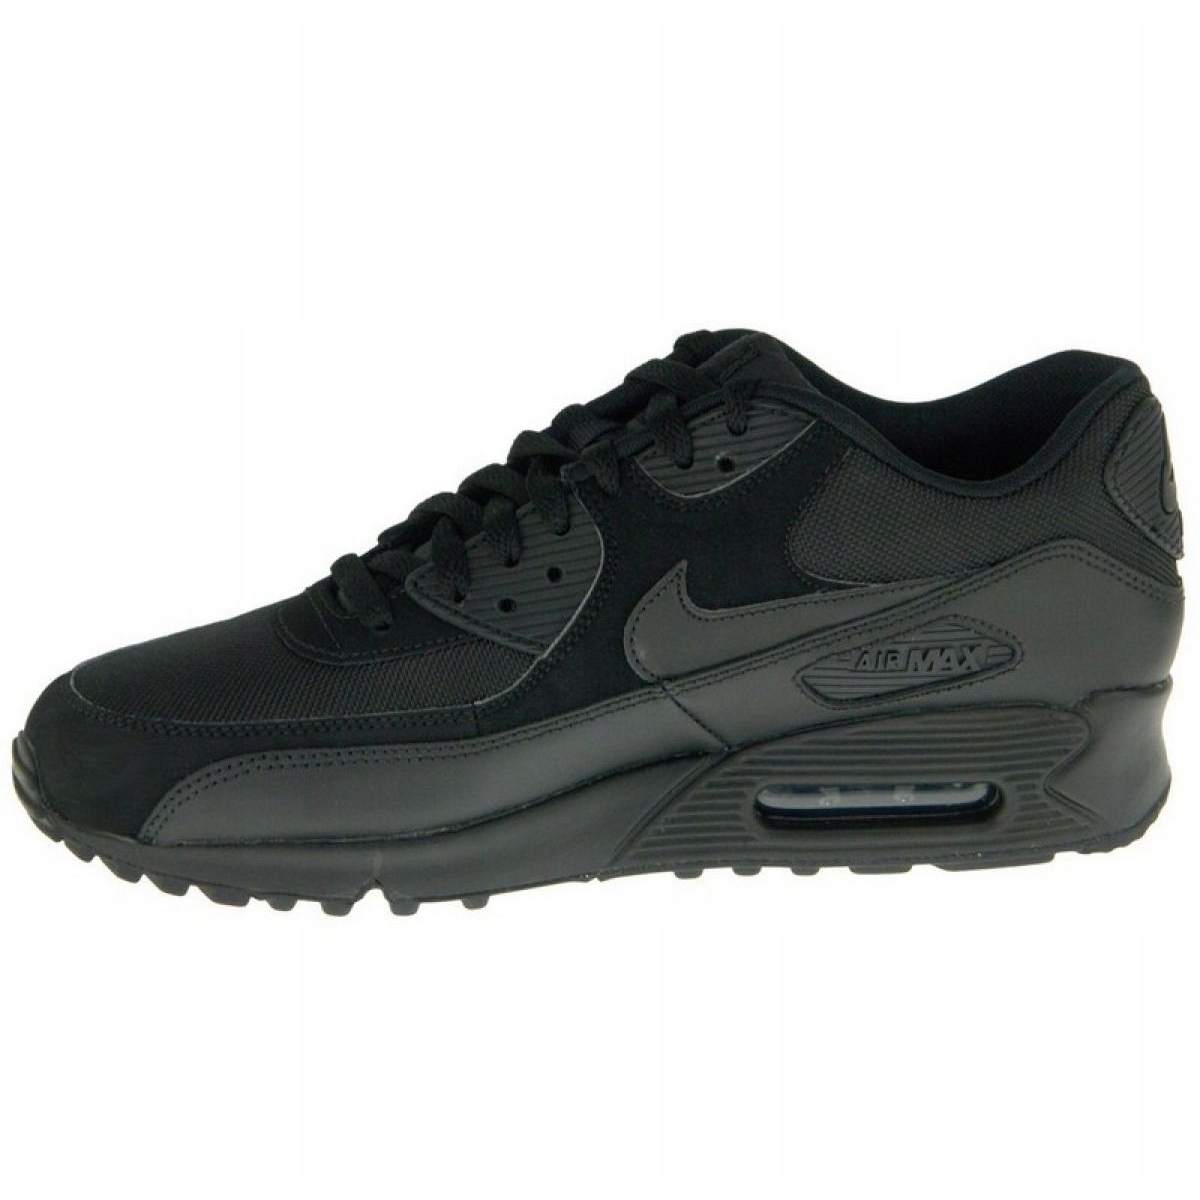 Nike Air Max 90 M 537384 090 calzado negro